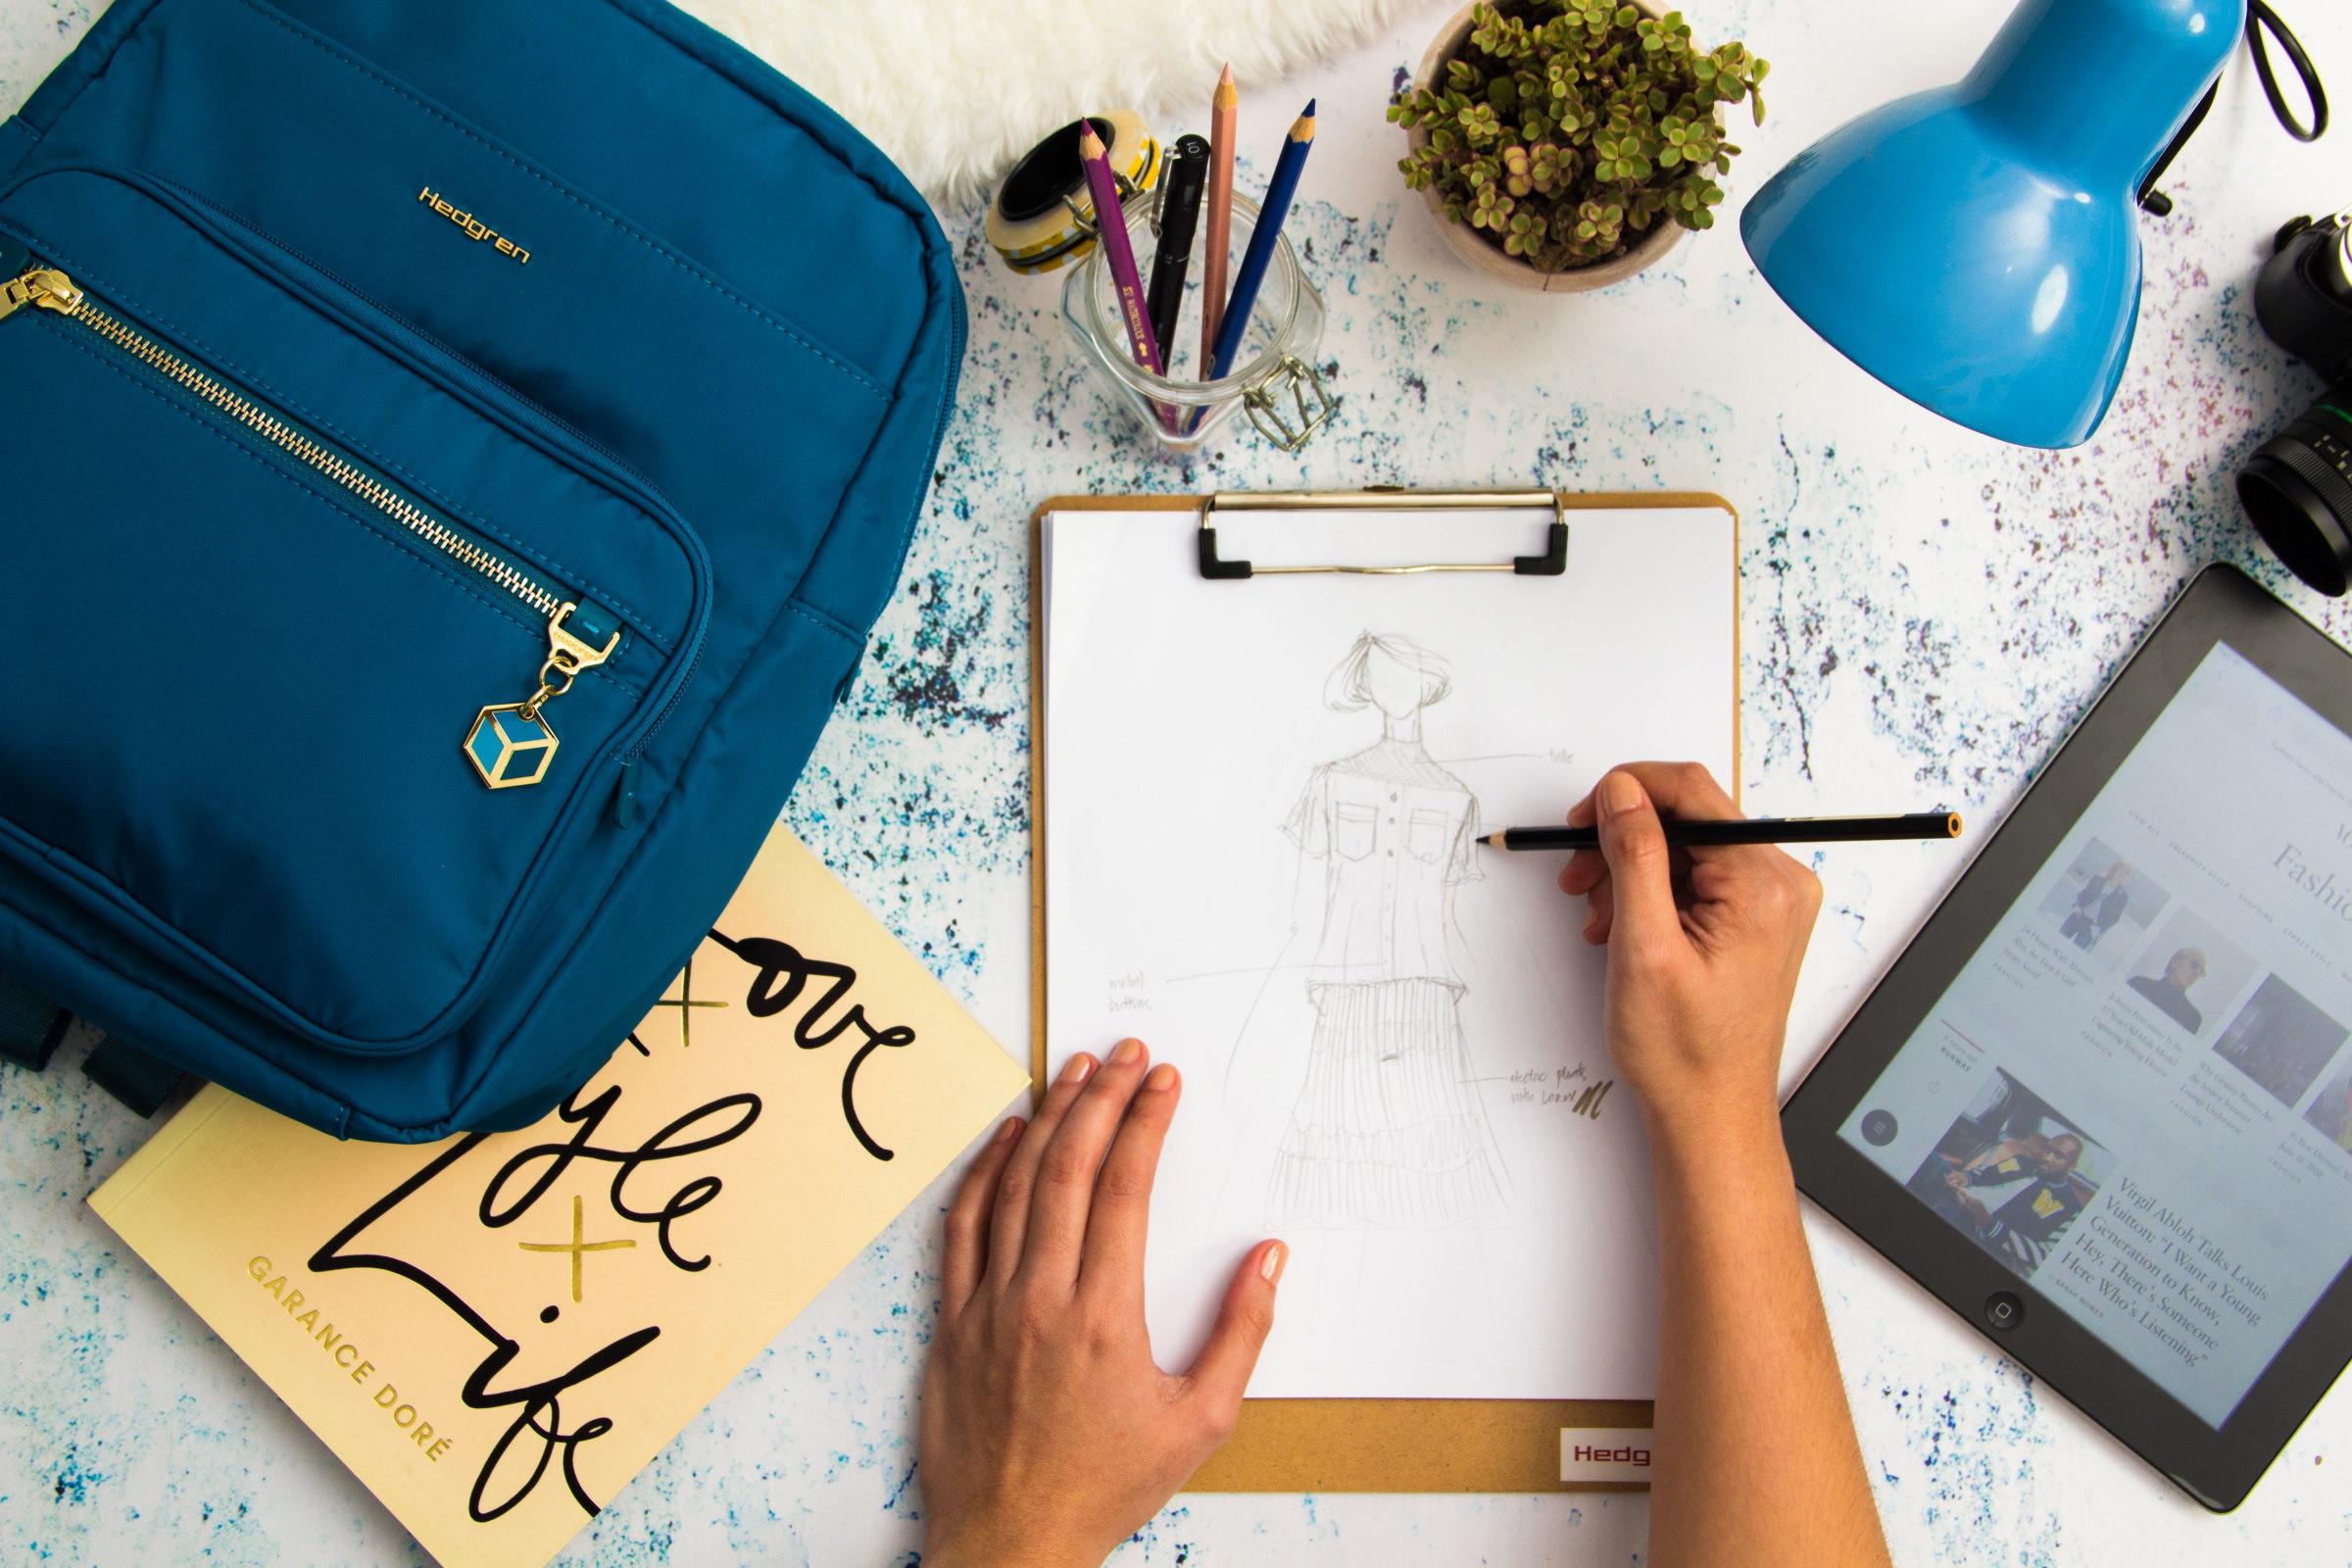 Mr Porter Futures Searches For Menswear Designers Of Tomorrow